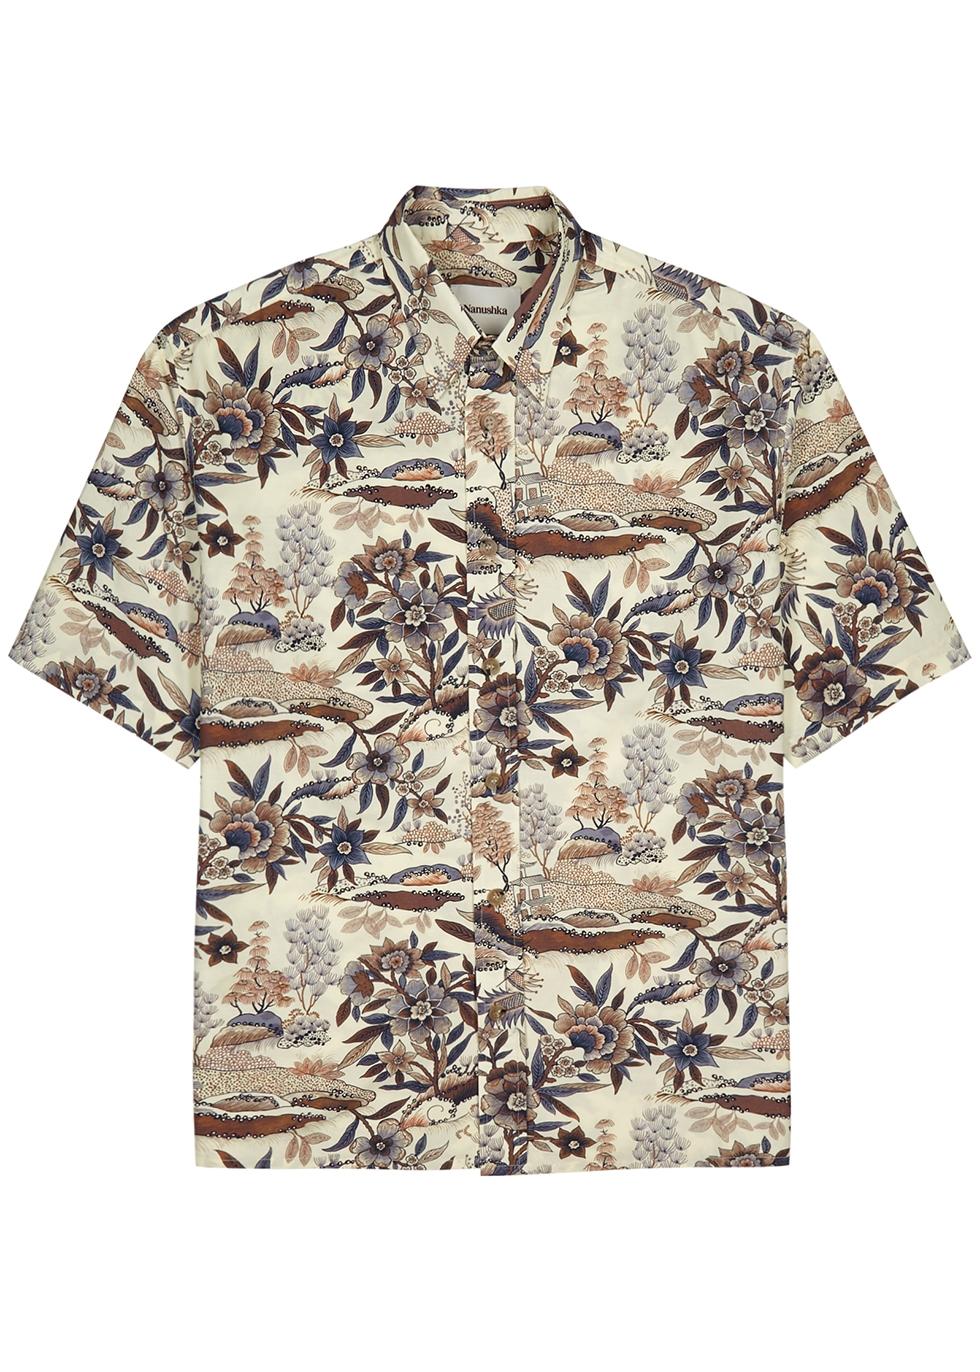 Alain printed cotton-blend shirt